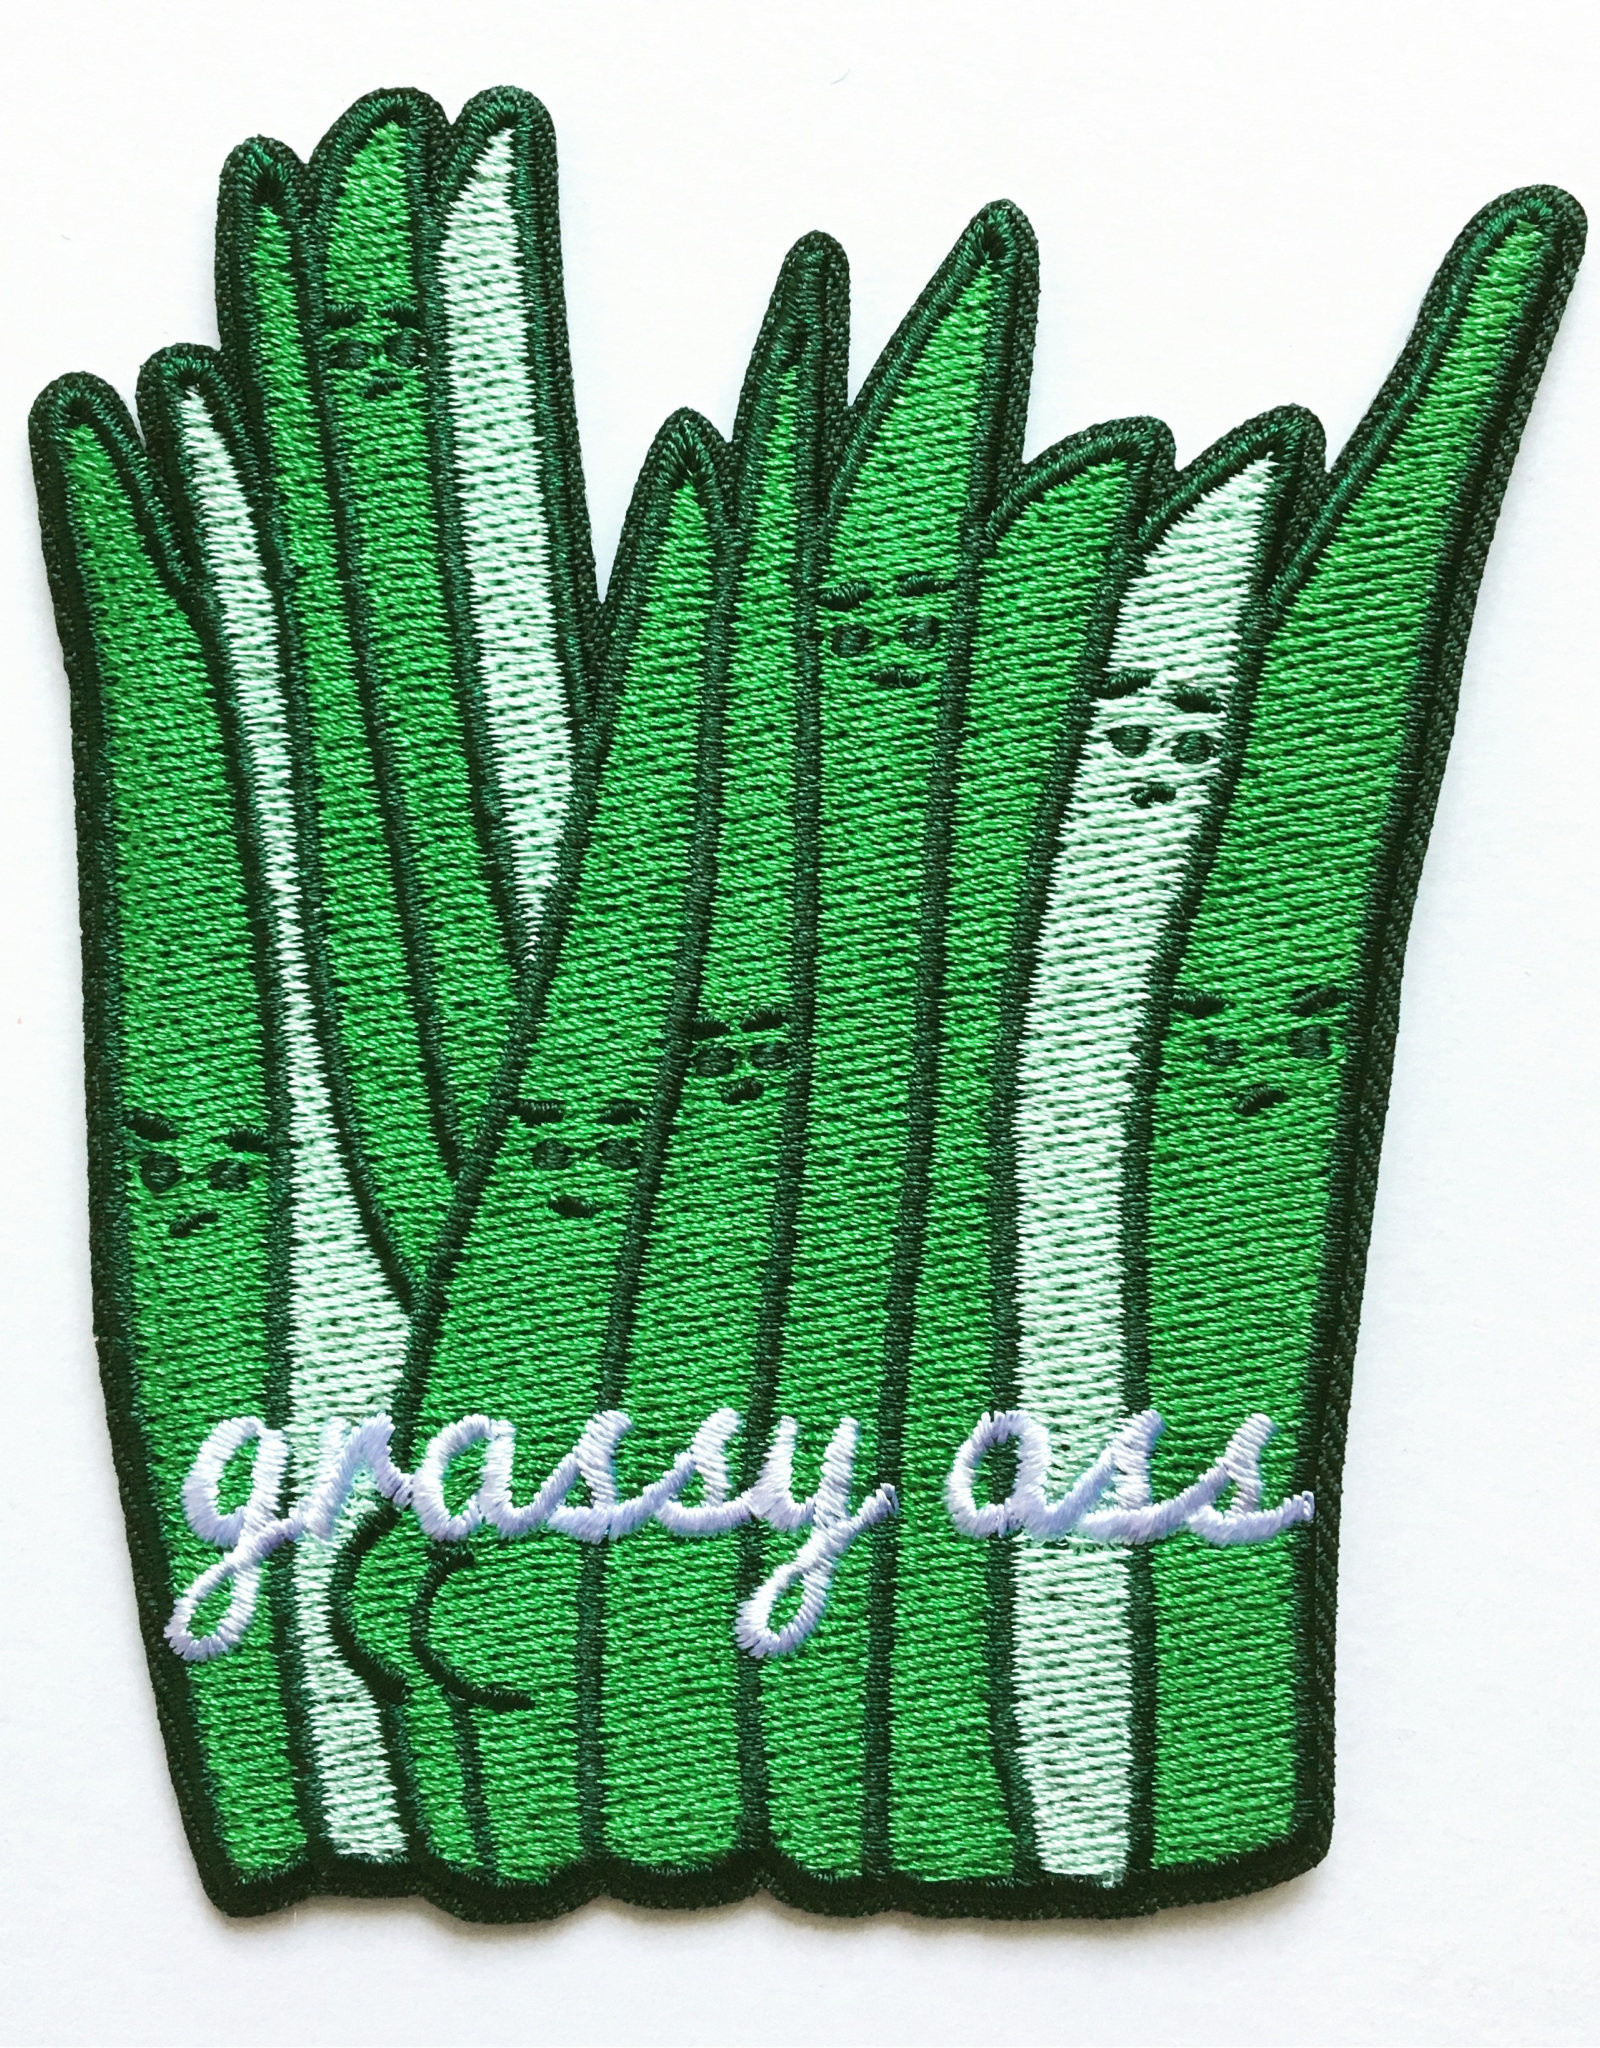 Ilootpaperie Grassy Ass Patch